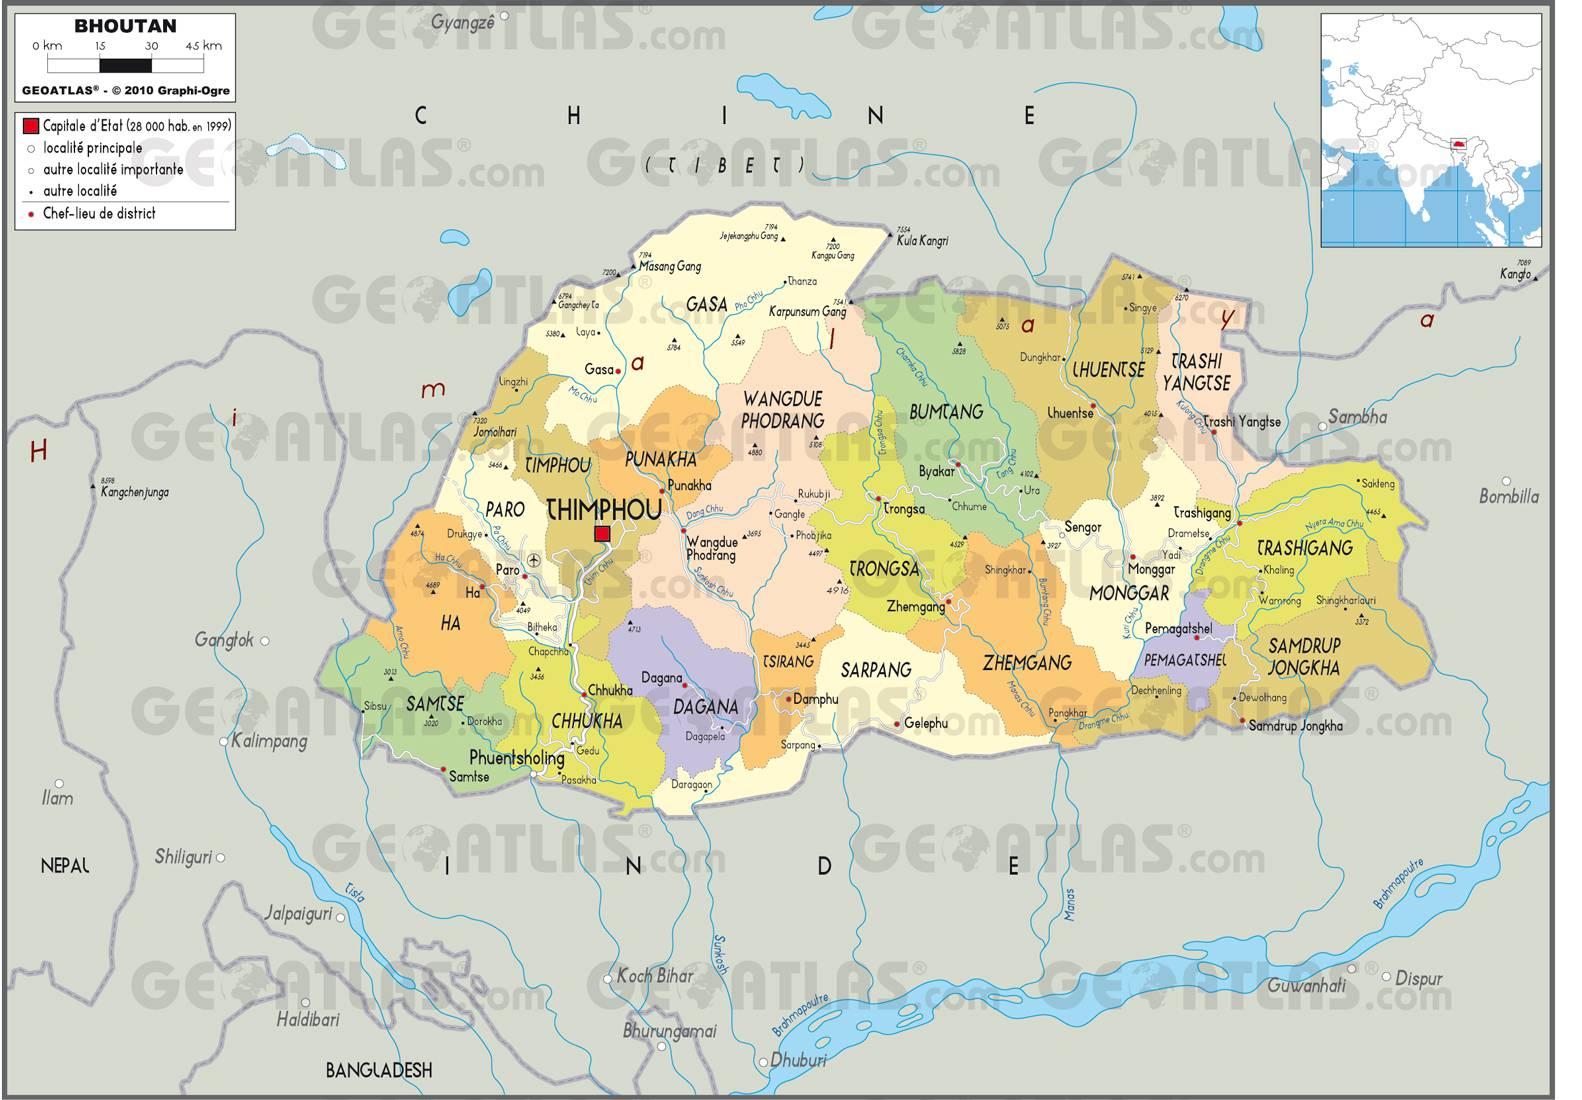 Carte Asie Bhoutan.Carte Du Bhoutan Plusieurs Cartes Du Pays En Asie